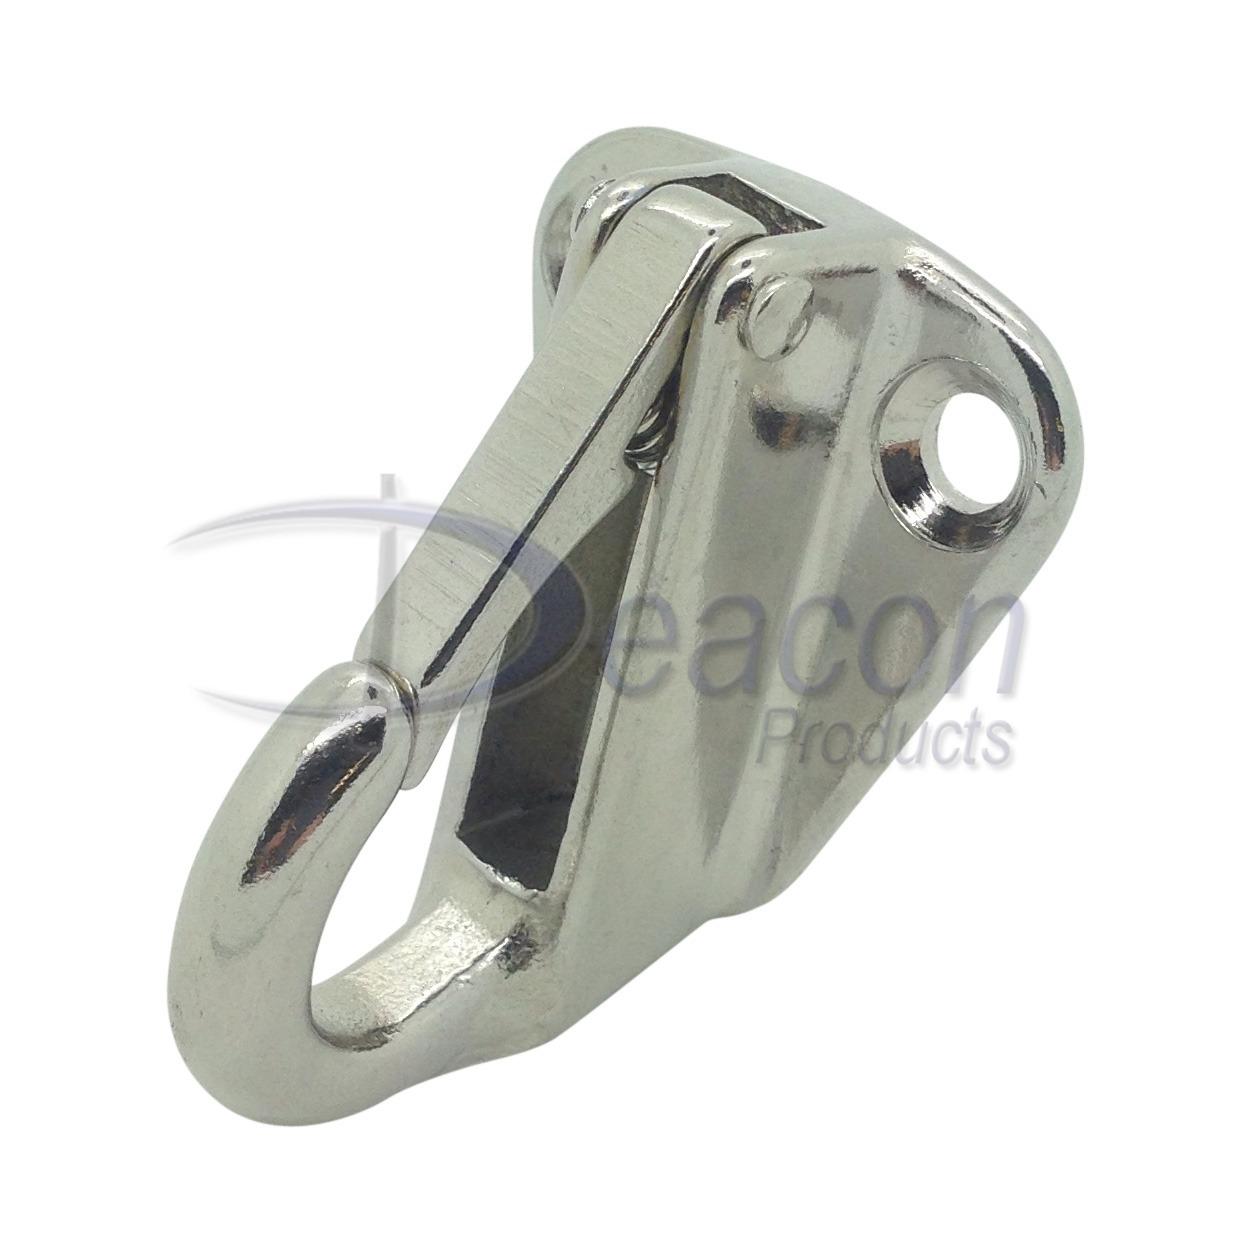 stainless-steel-fending-hook-catch